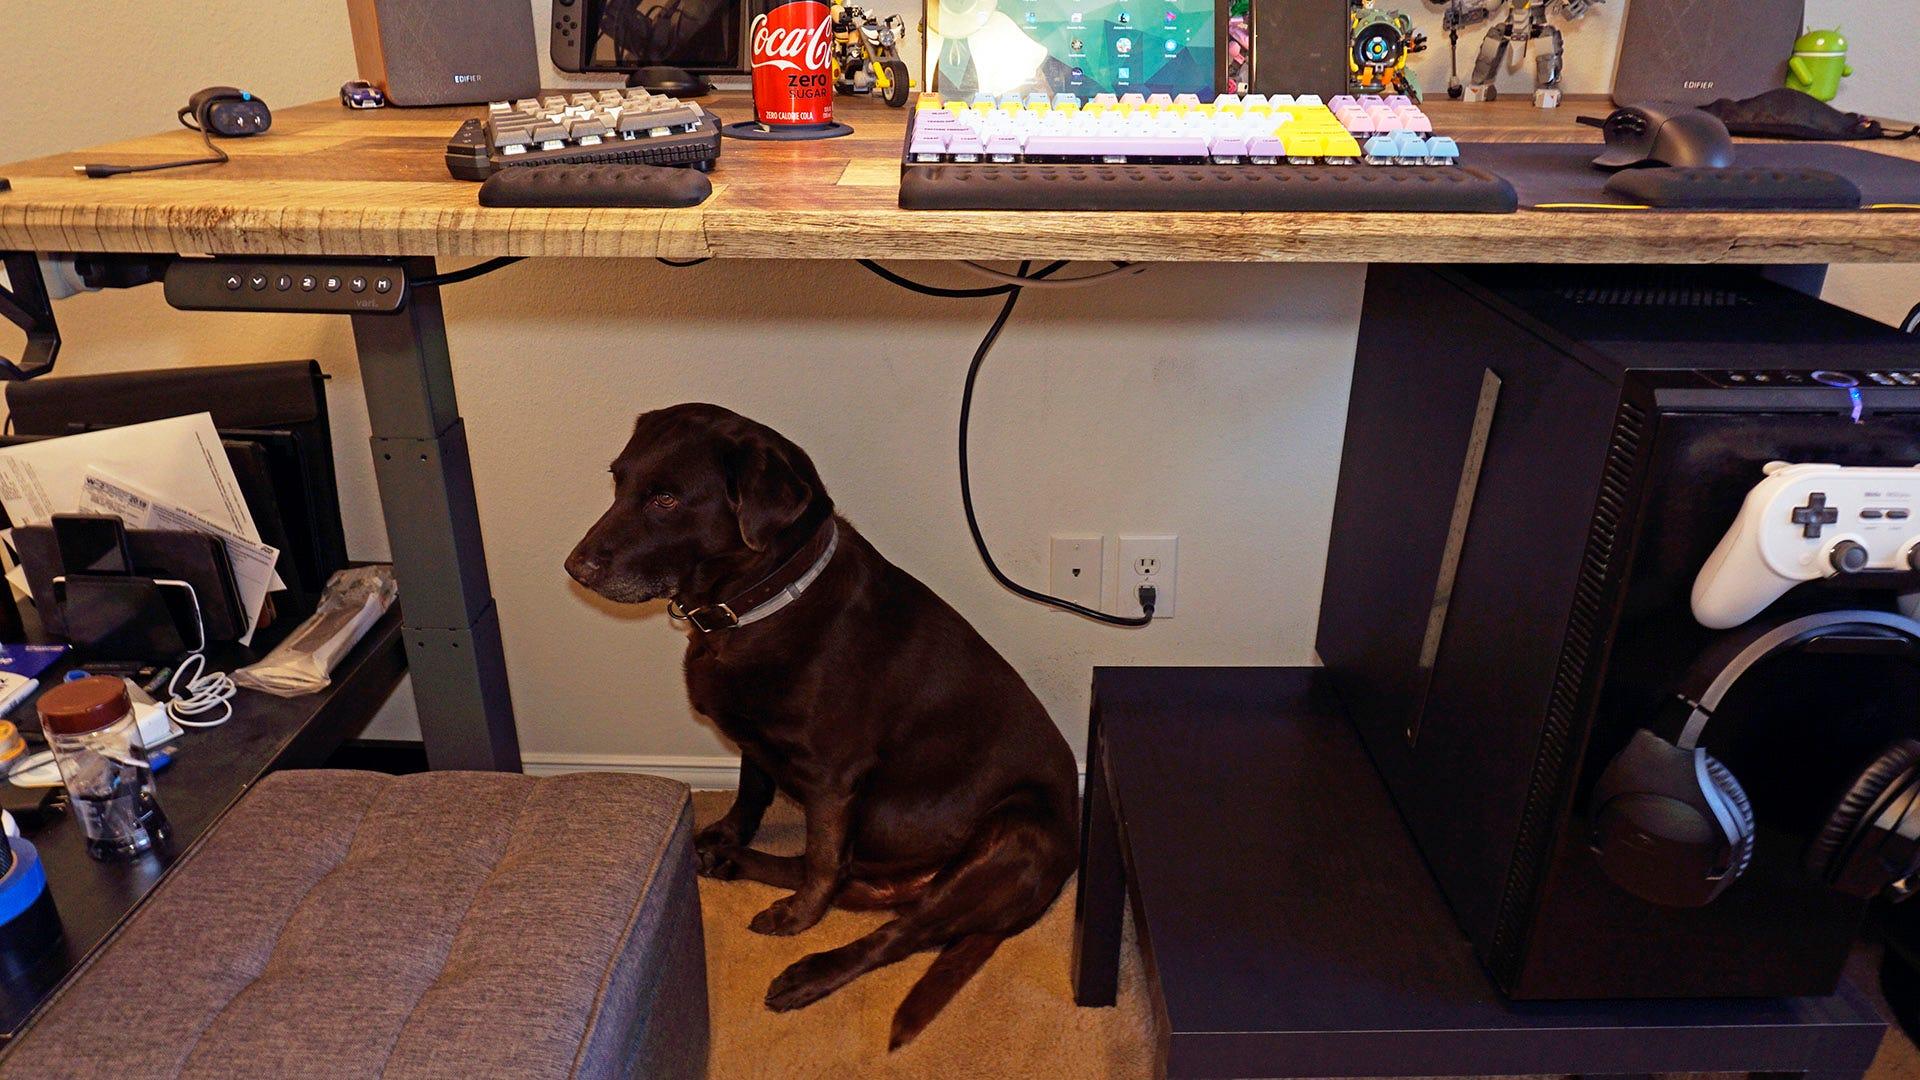 Dog underneath Vari standing desk